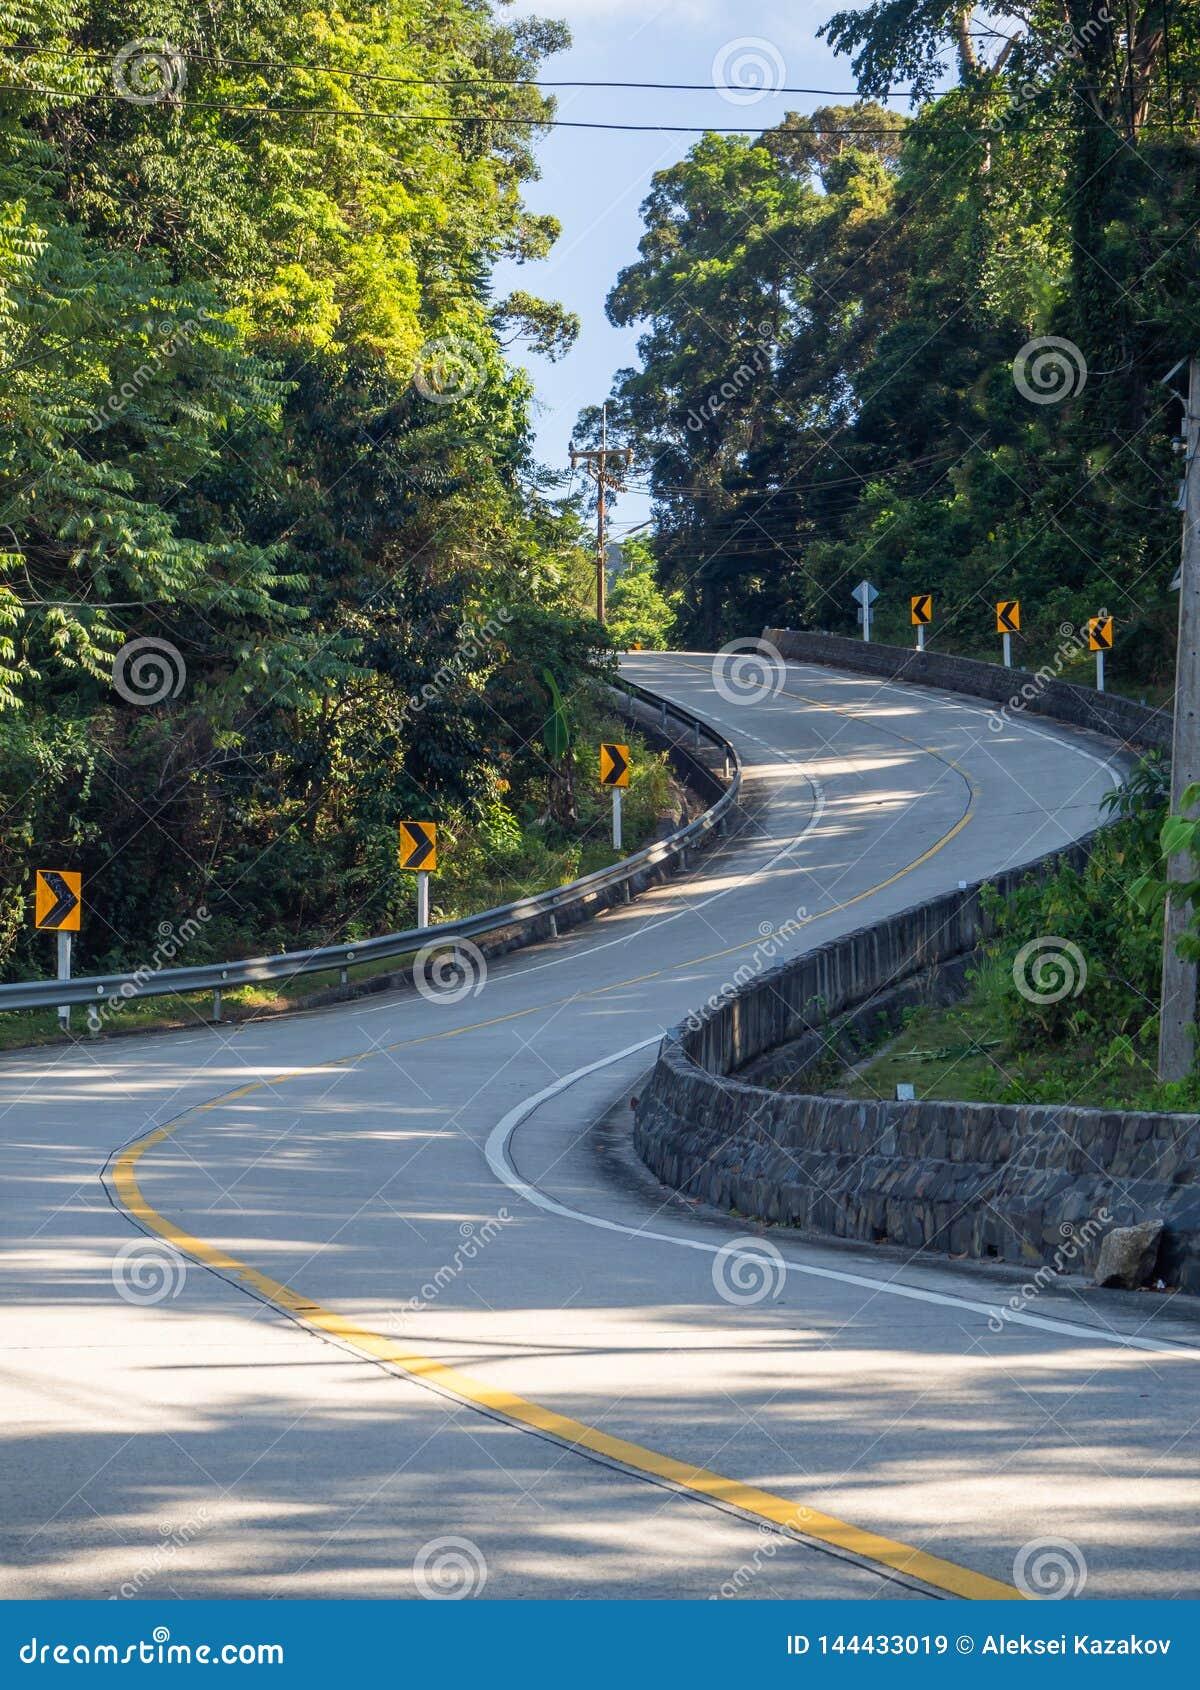 On The Beautiful Roads Of Koh Phangan Stock Image Image Of Landscape Sunlight 144433019